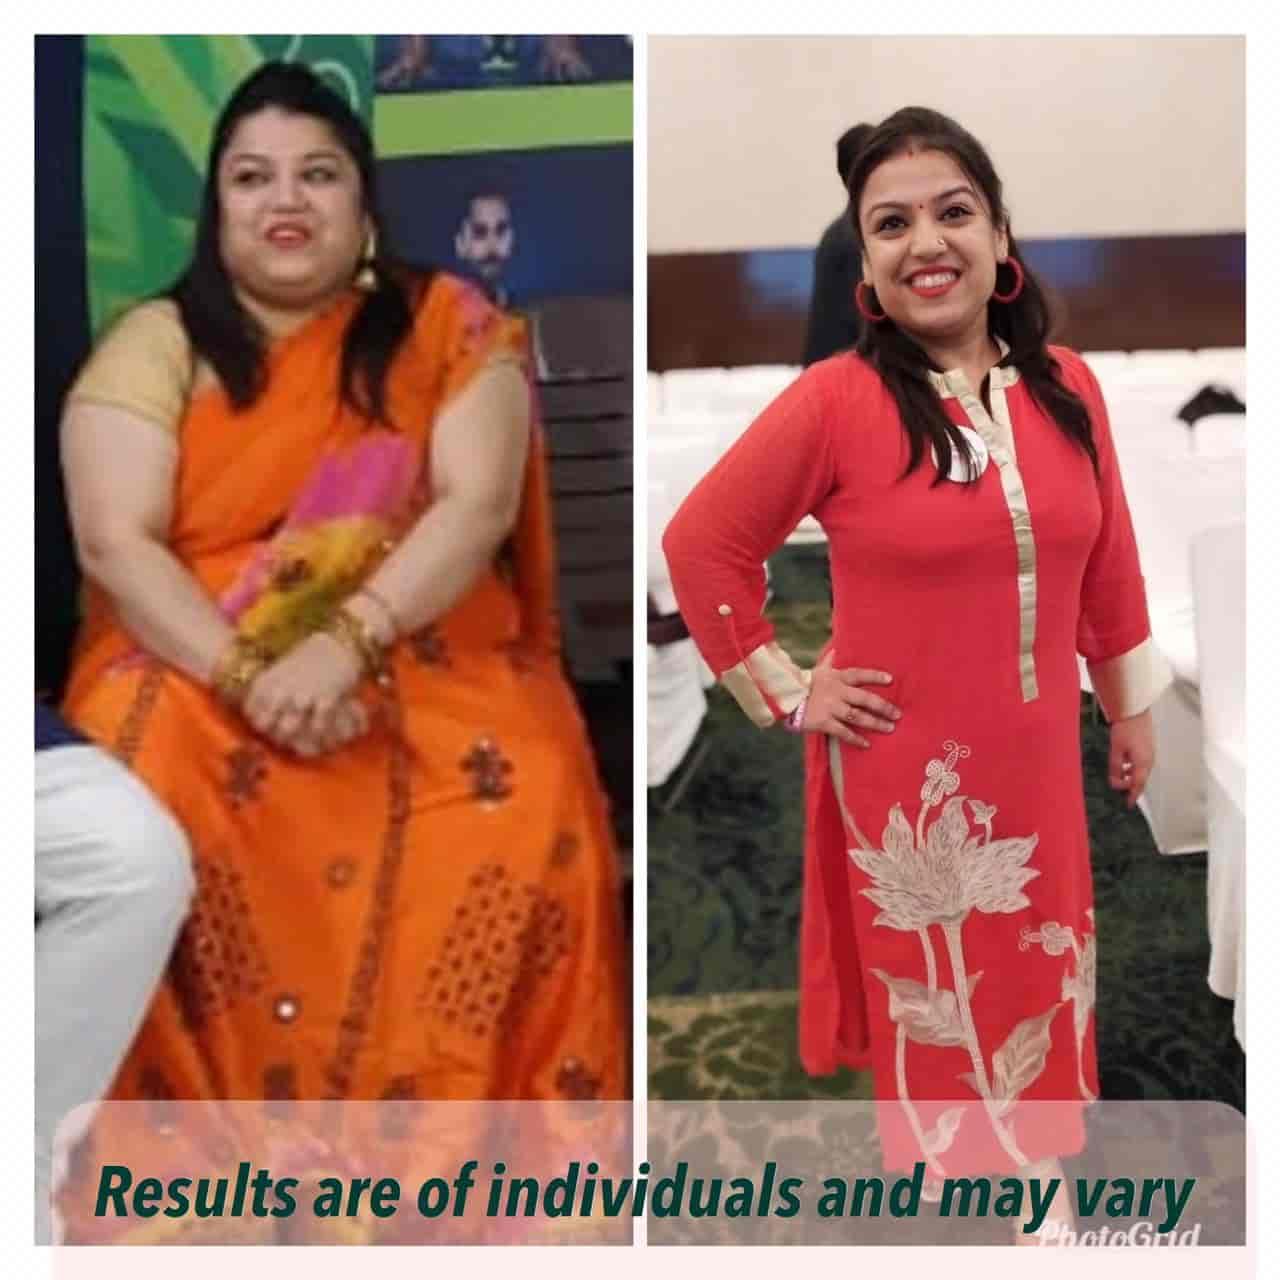 Weight Loss Weight Gain Herbalife Distributor Photos, Mansarovar